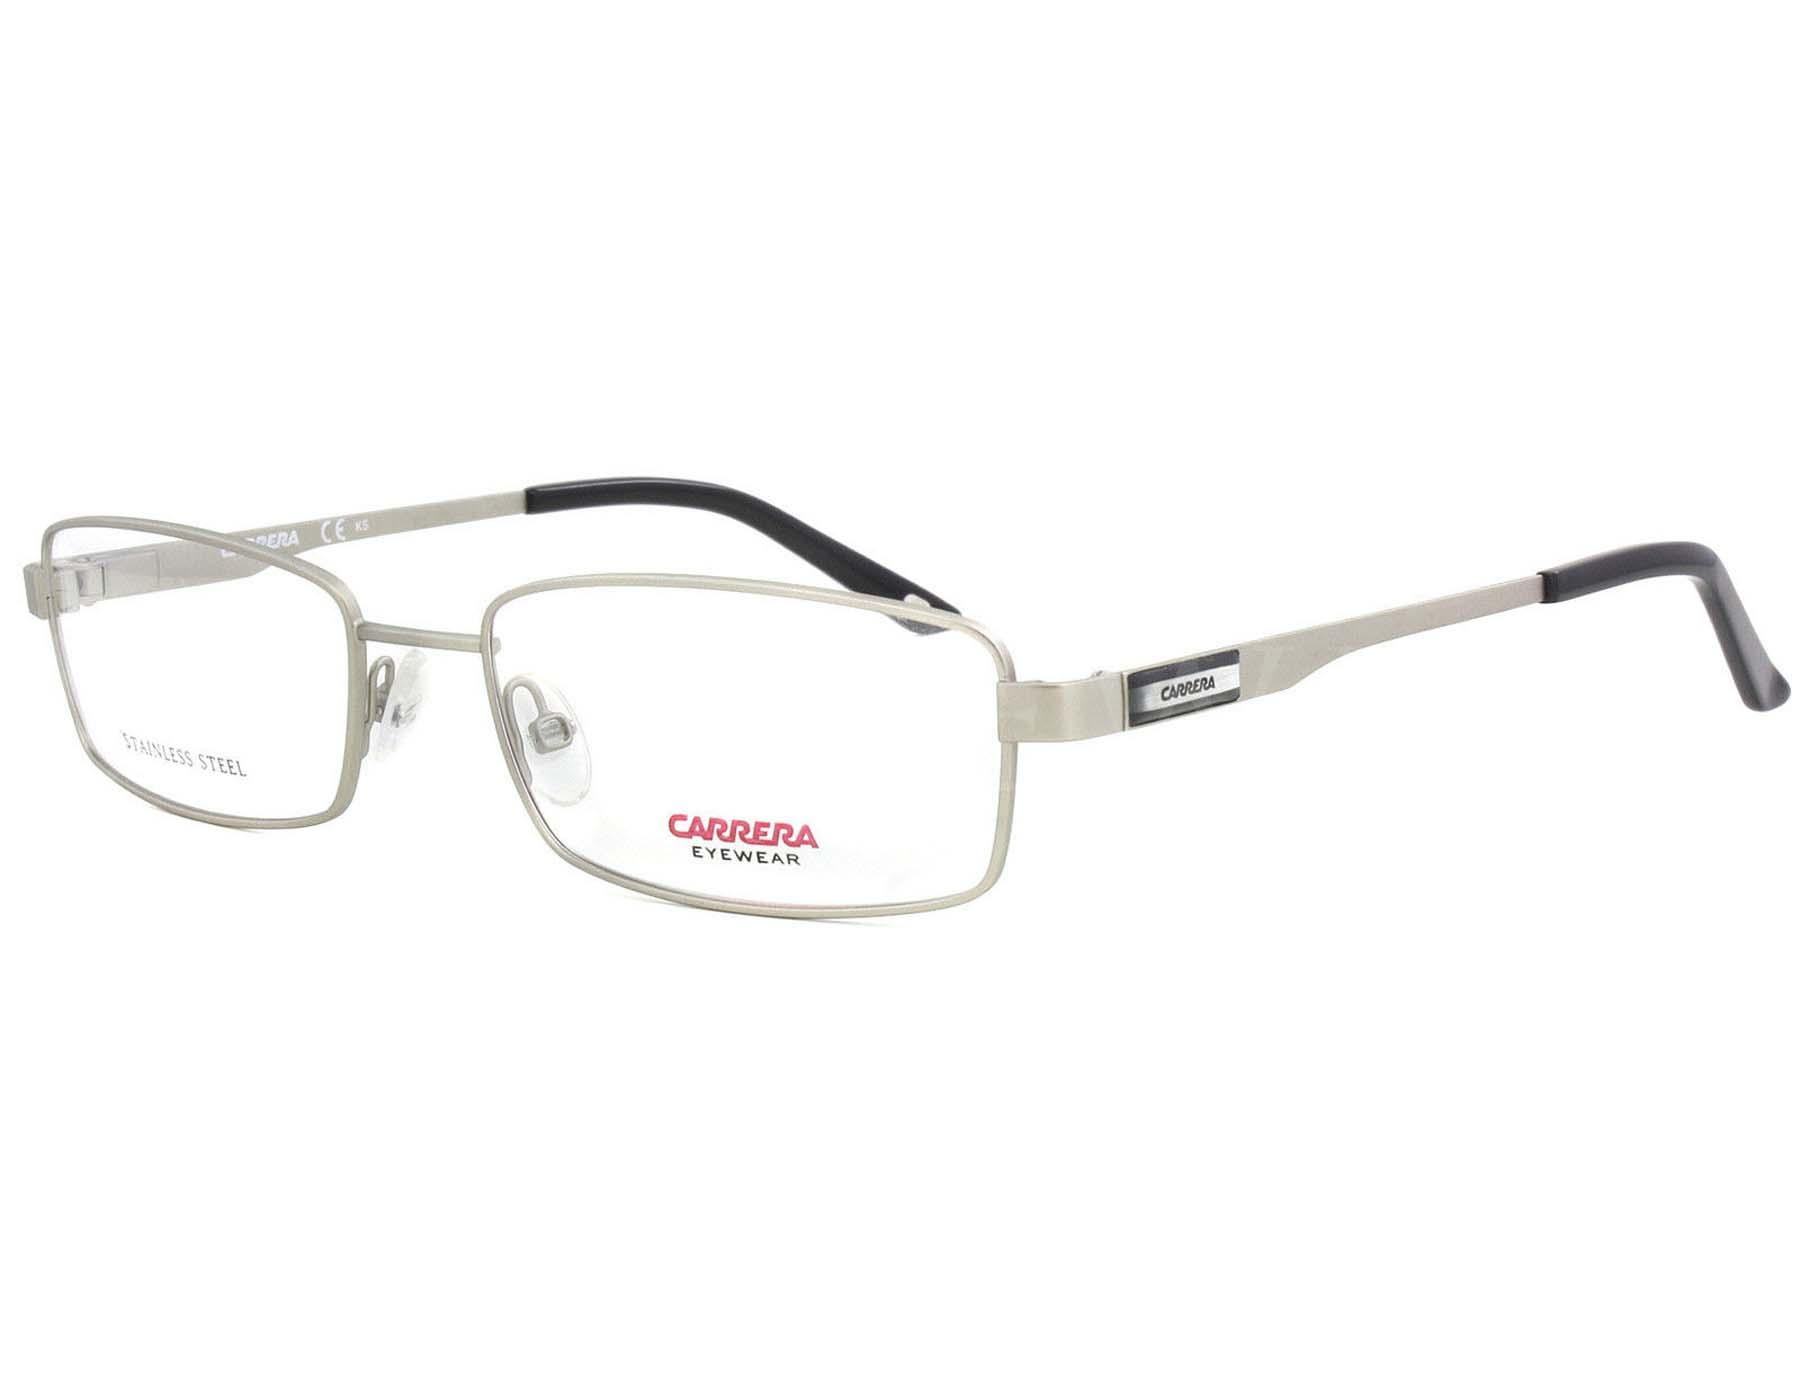 a4be50254b4 NEW Carrera CA7553-011 Palladium 53mm Eyeglasses 827886993123